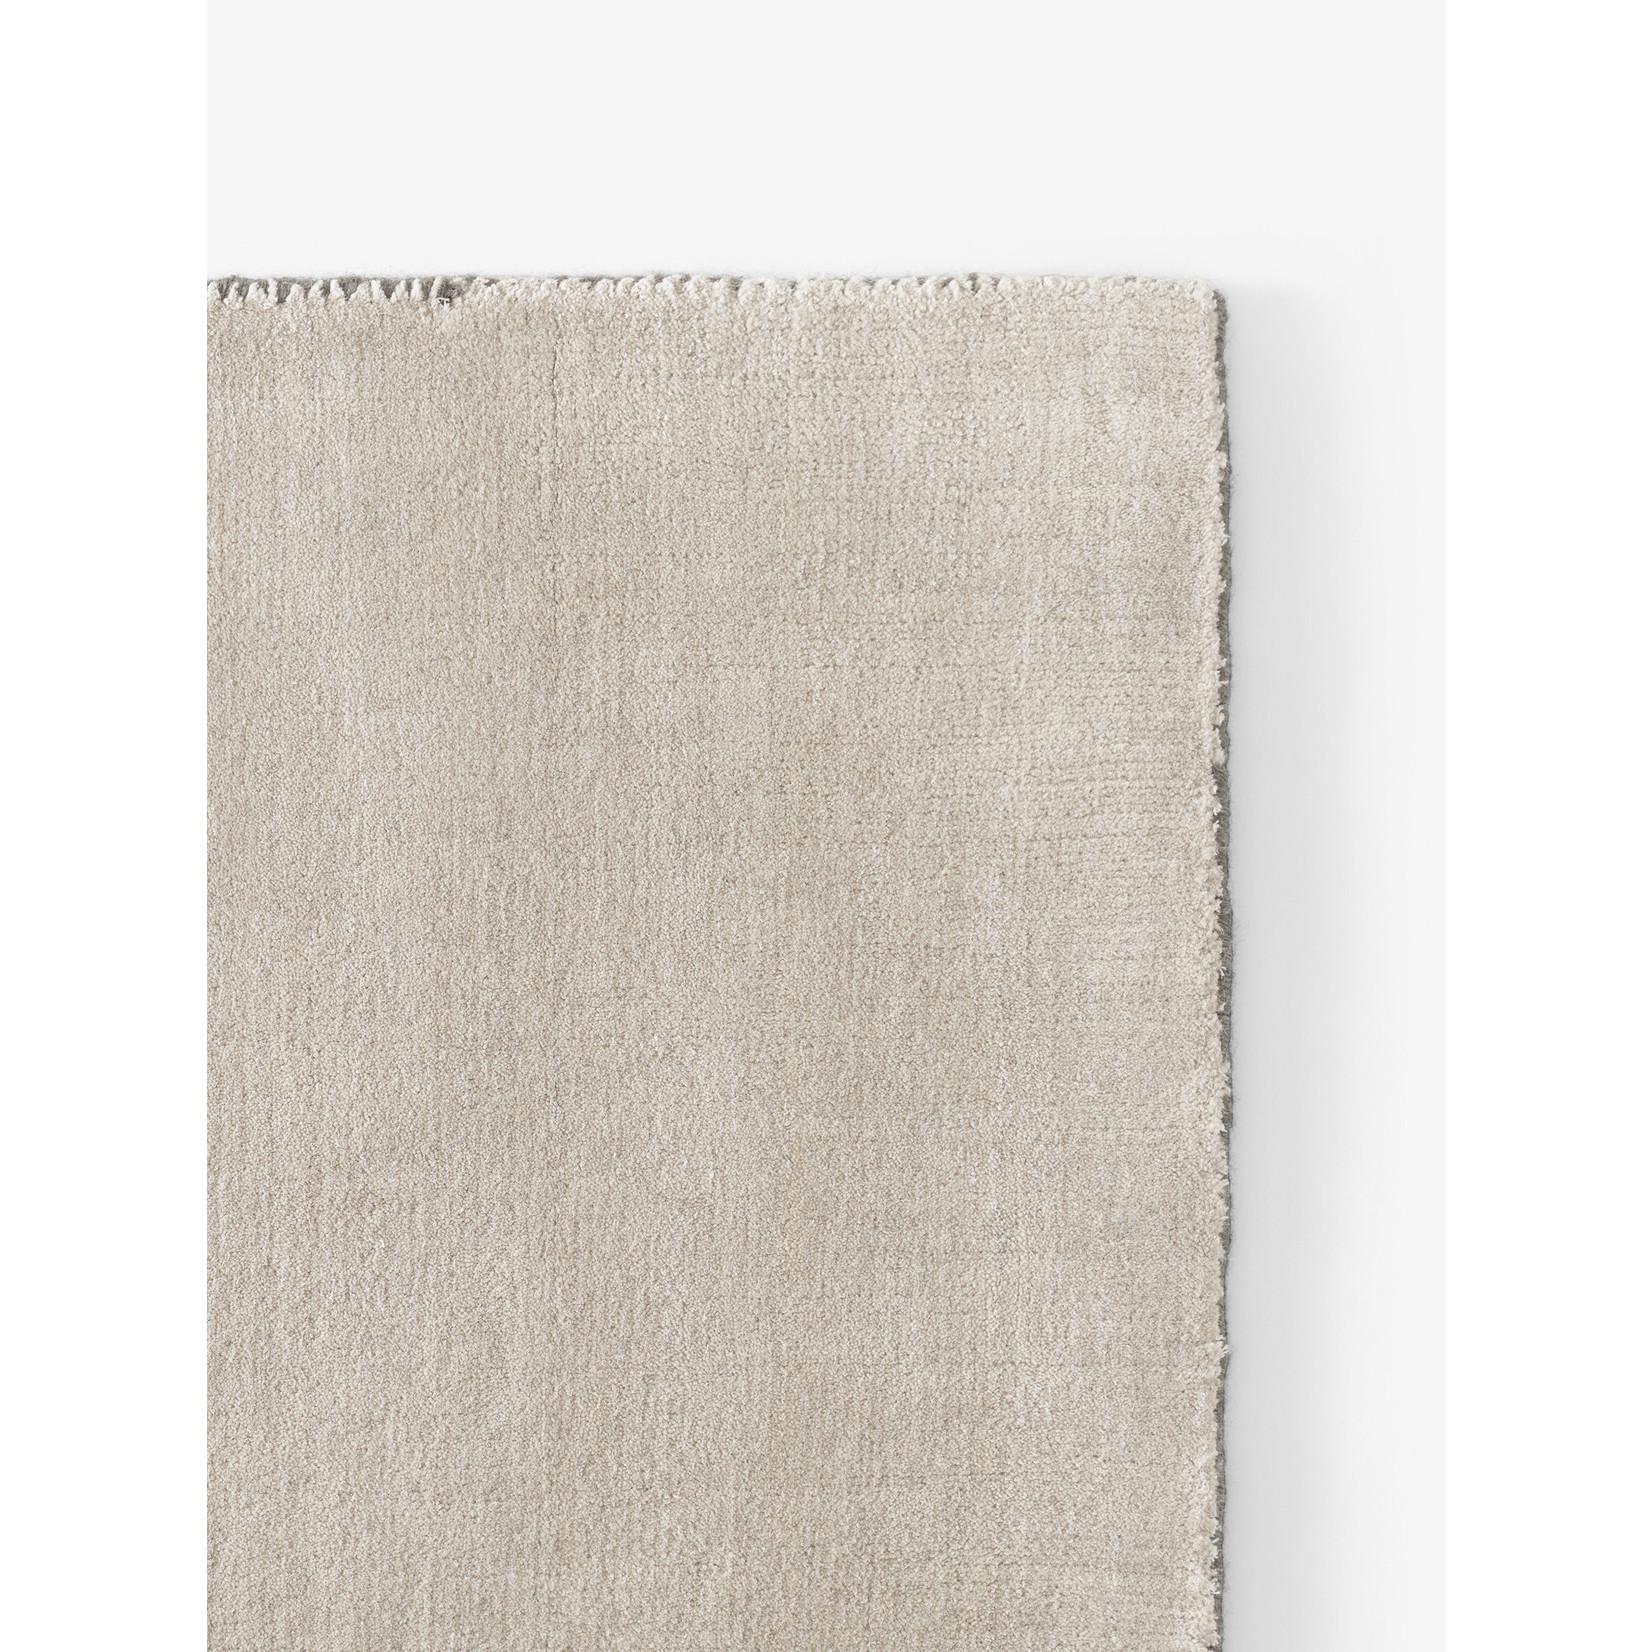 &Tradition The Moor AP5 | Rosée beige 170x240cm